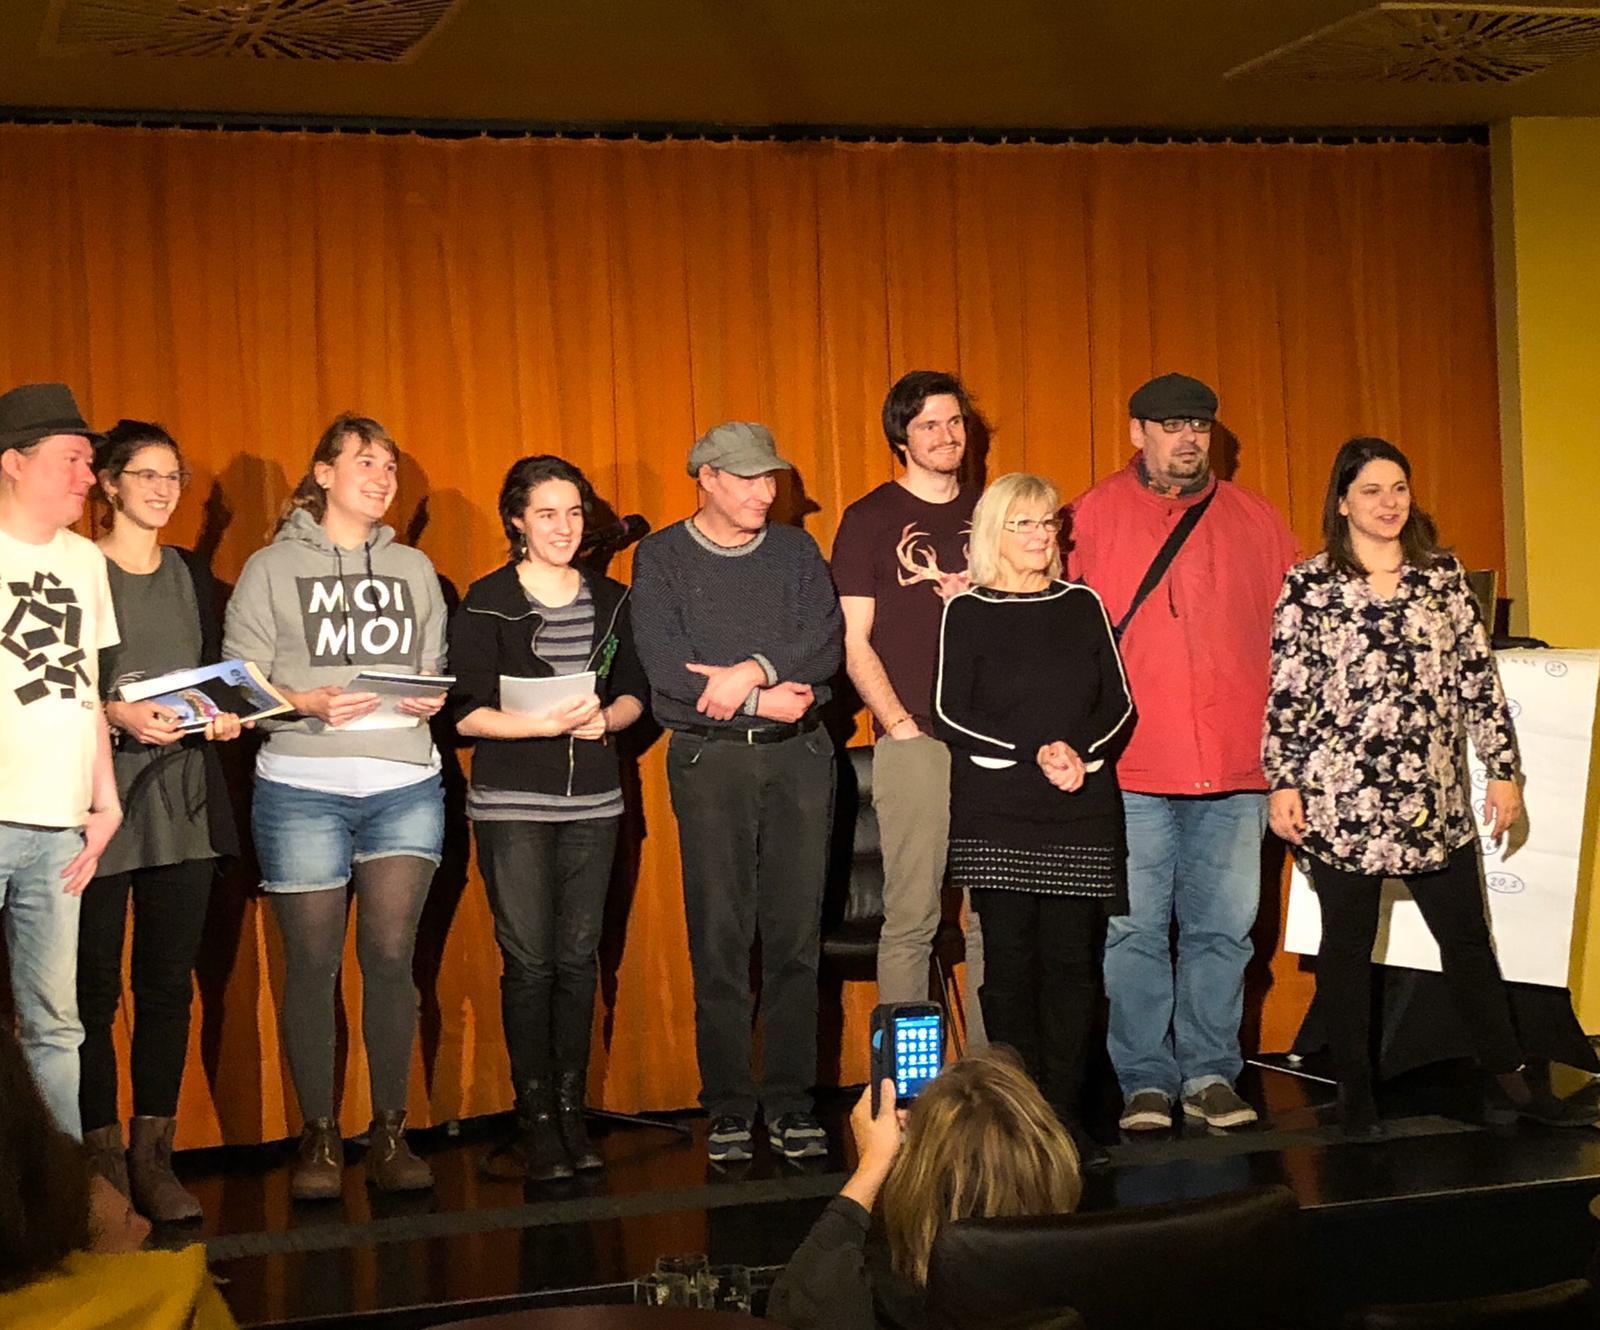 v. links n. rechts: Andi Pianka. Tina Cakara, Nicola Jünger, Sarah Buchinger, drei weitere Teilnehmer, Eva Riebler und Marlies Eder